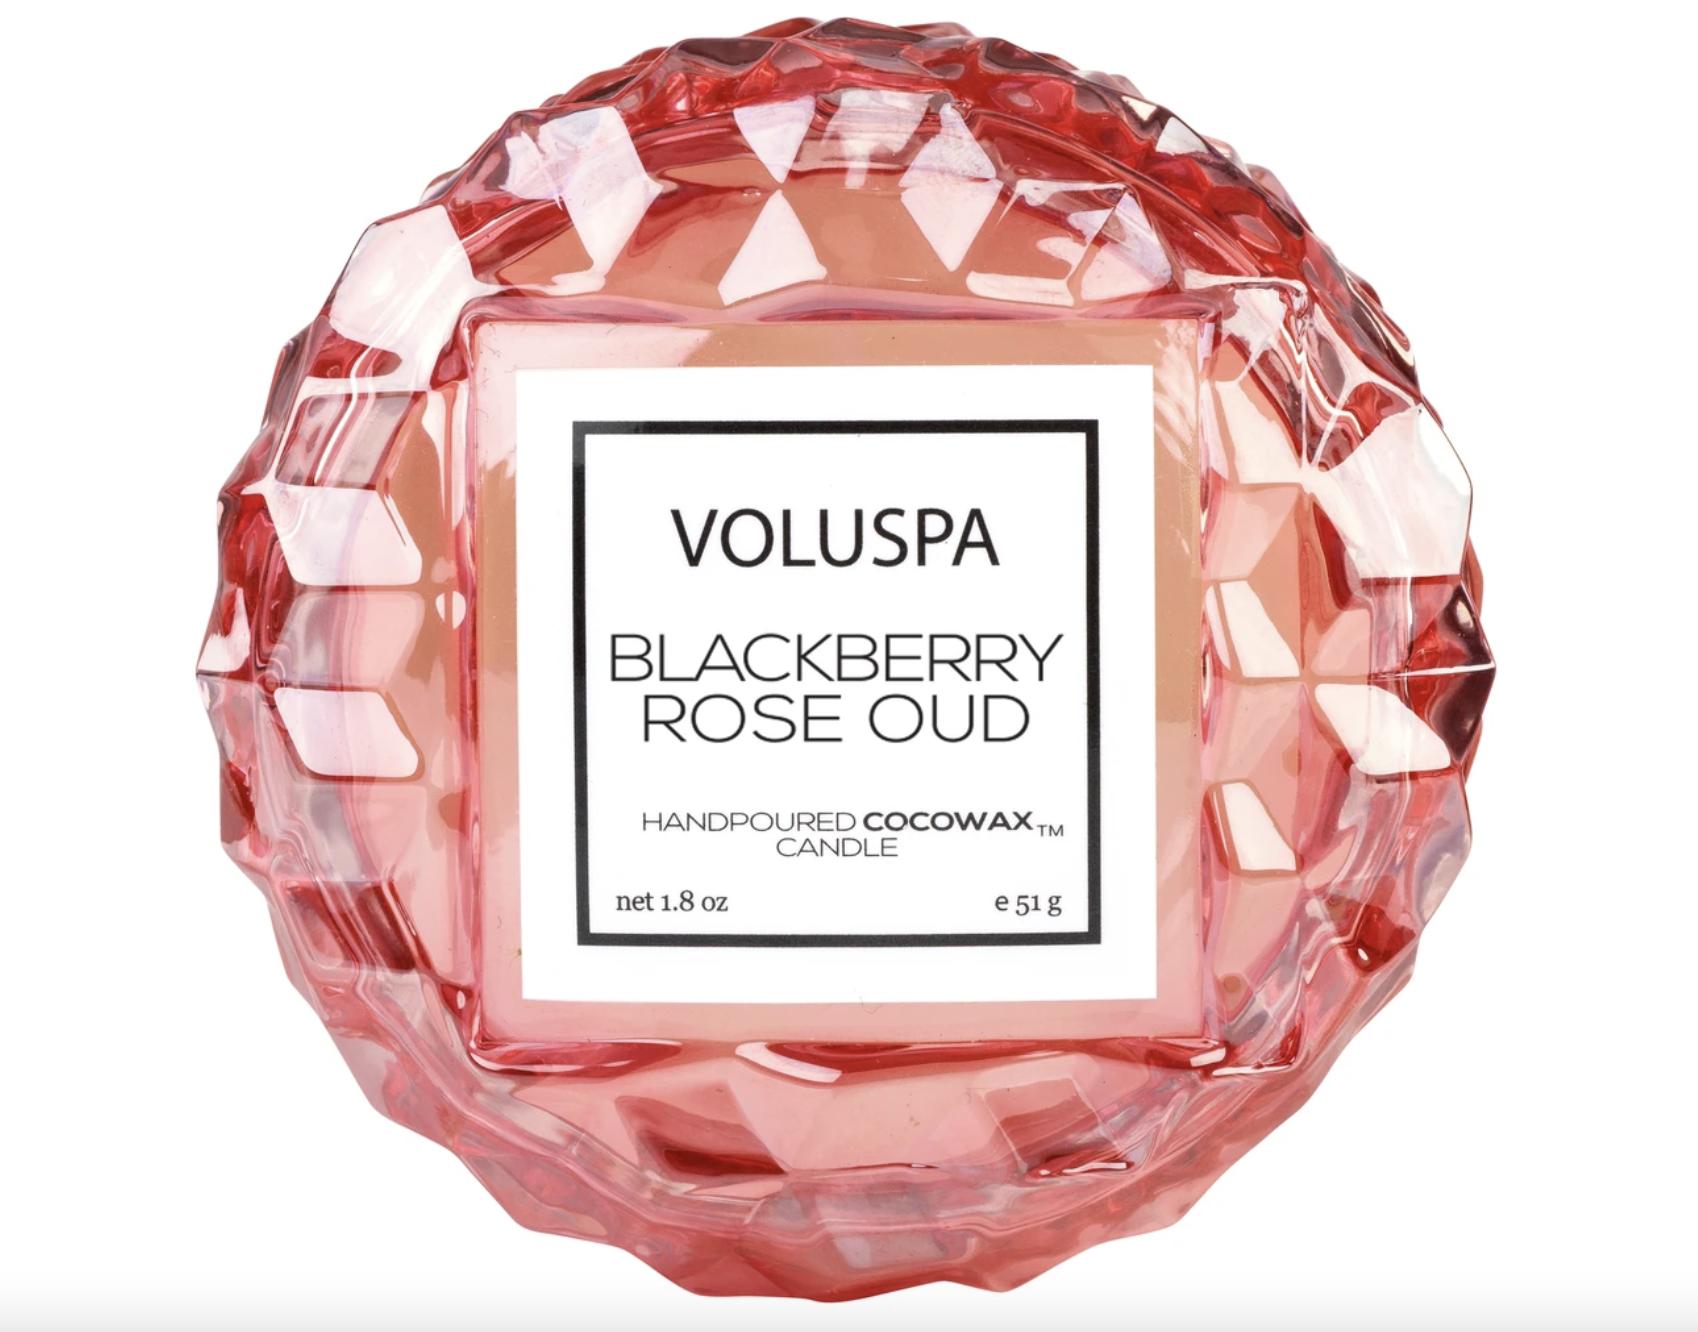 Voluspa Blackberry Rose Oud, Macaron Candle